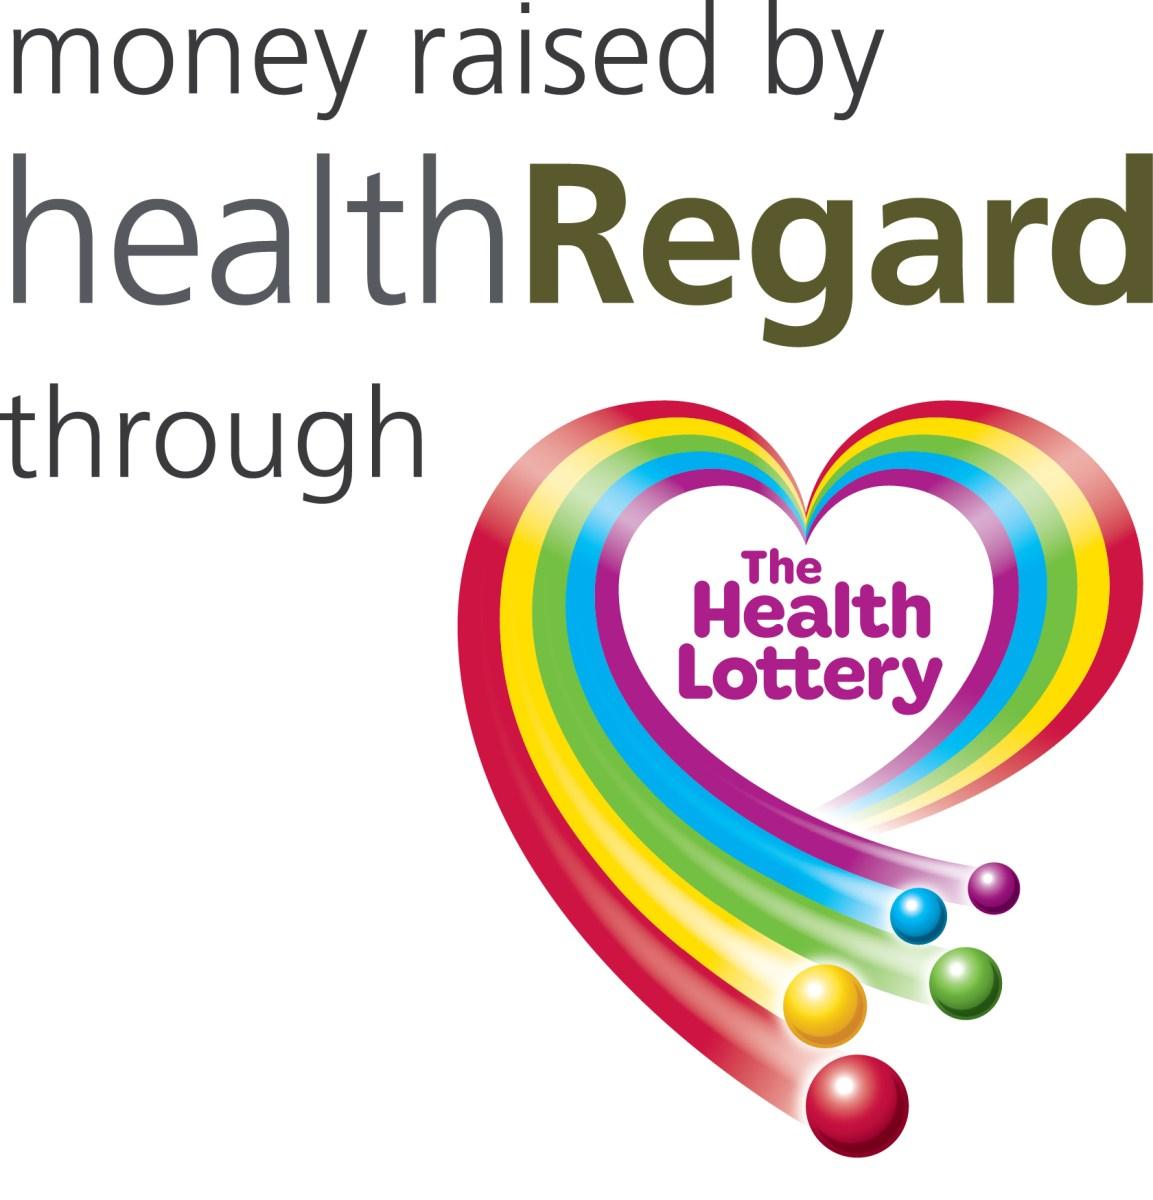 healthRegard_MRL